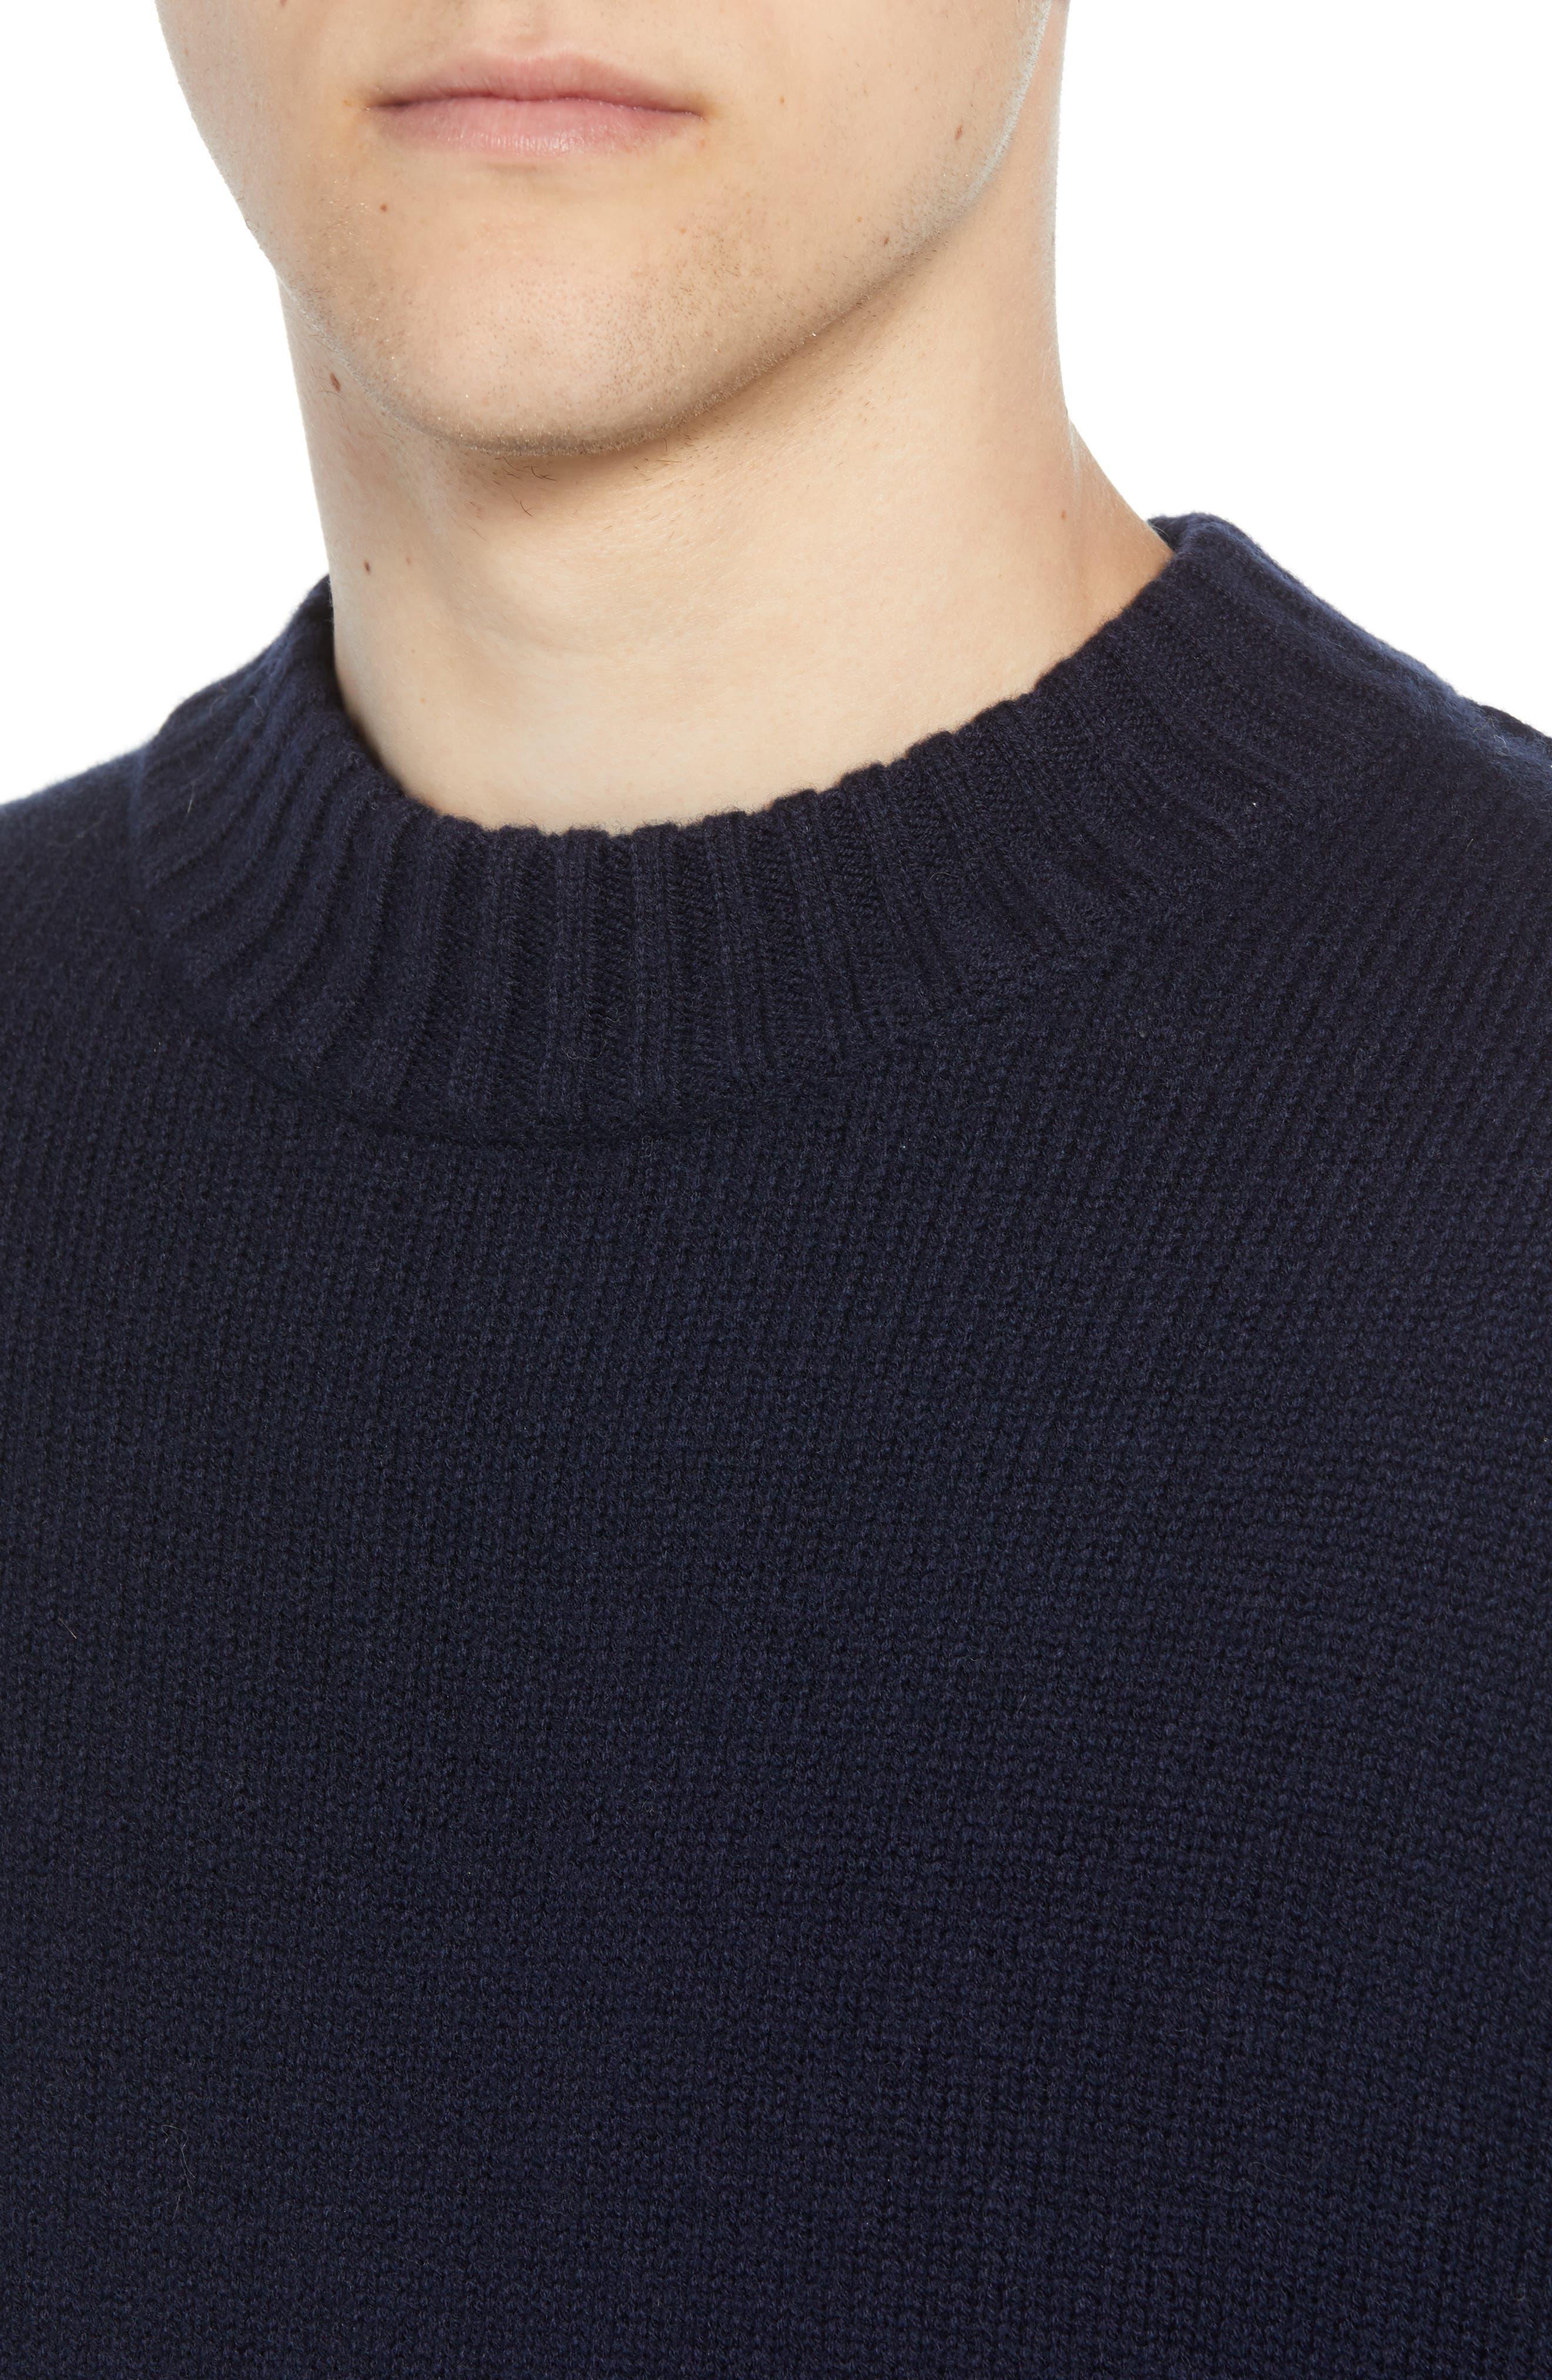 Fisherman Wool Blend Crewneck Sweater,                             Alternate thumbnail 4, color,                             UTILITY BLUE